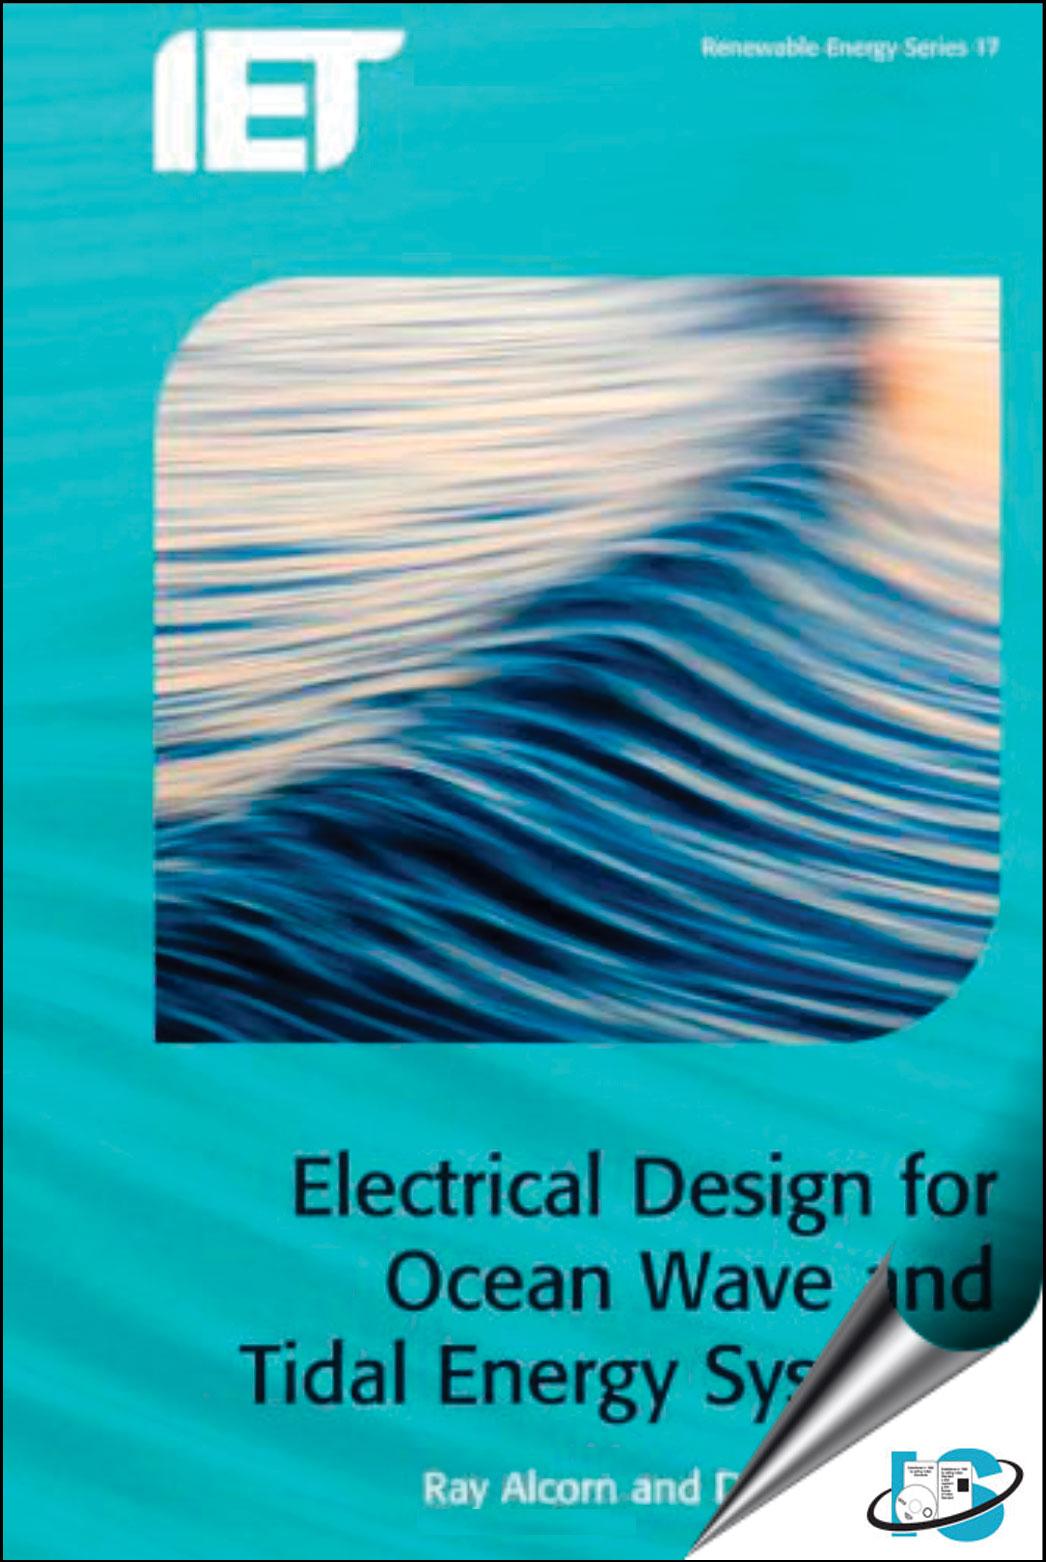 Electrical Design For Ocean Wave And Tidal Energy Systems Dara O Sullivan Raymond Alcorn 1849195617 9781849195614